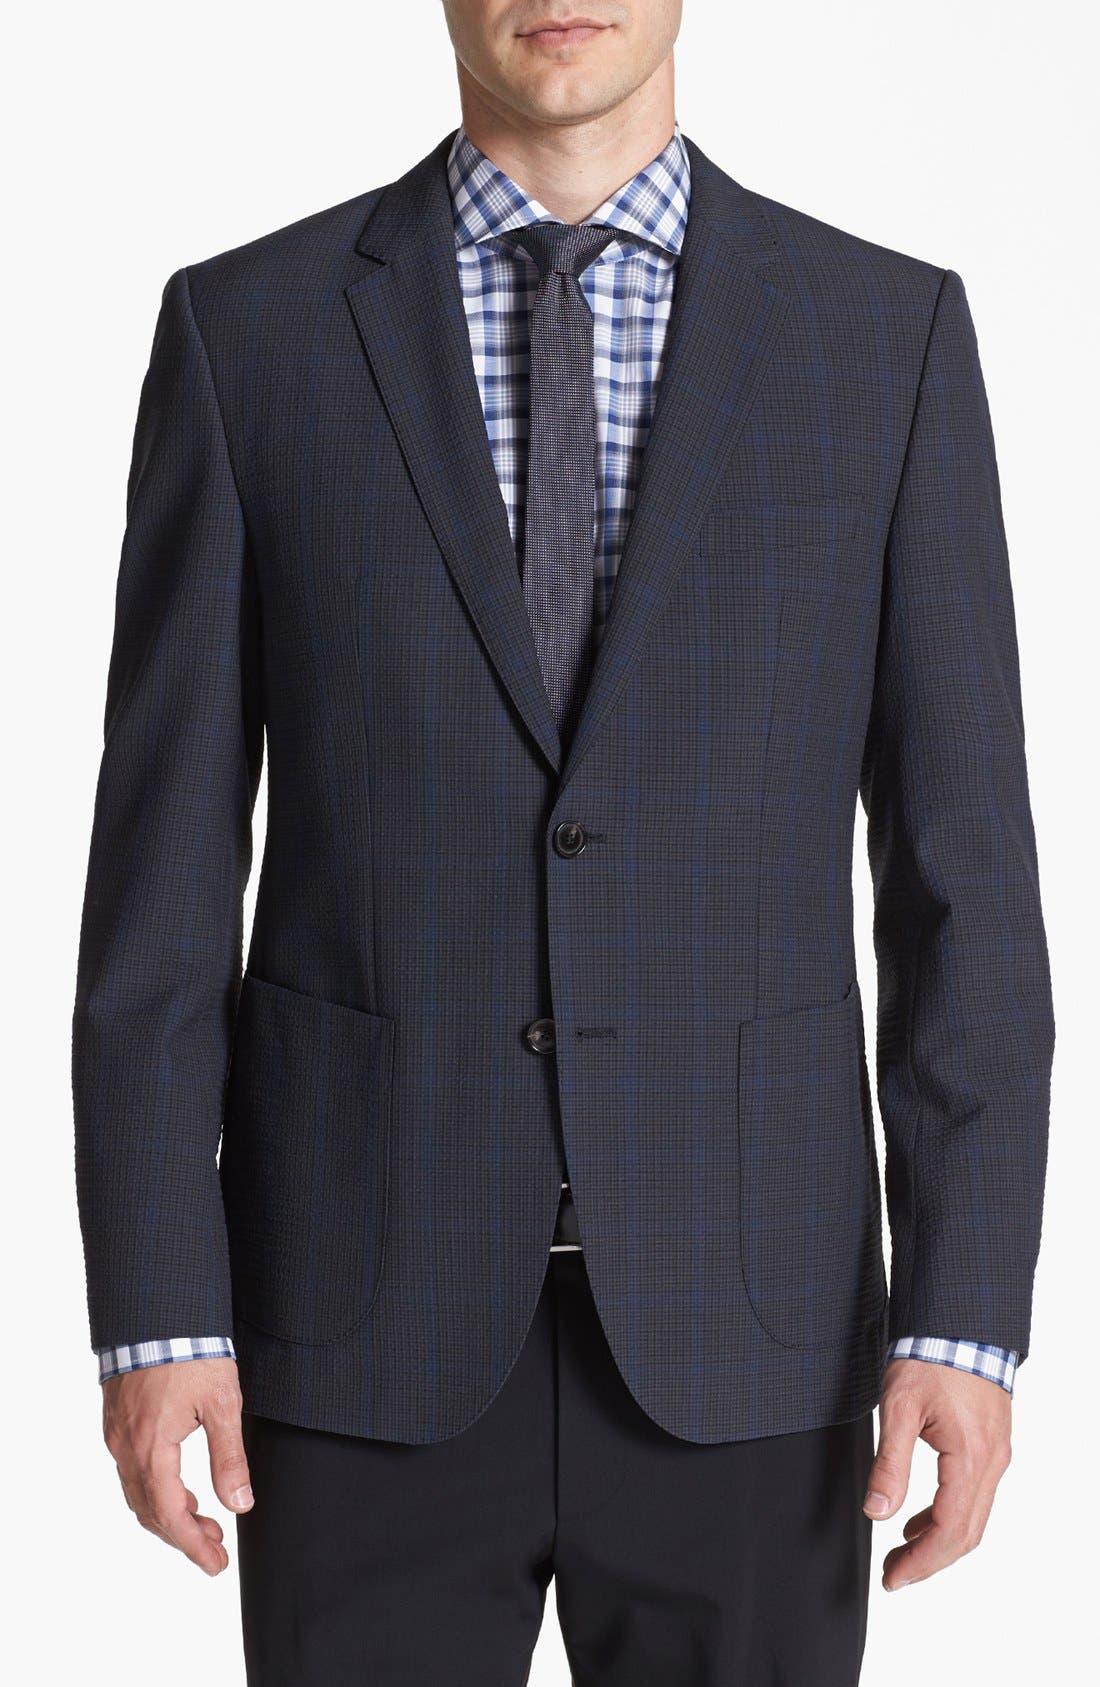 Alternate Image 1 Selected - BOSS HUGO BOSS 'Jesse' Trim Fit Plaid Sportcoat